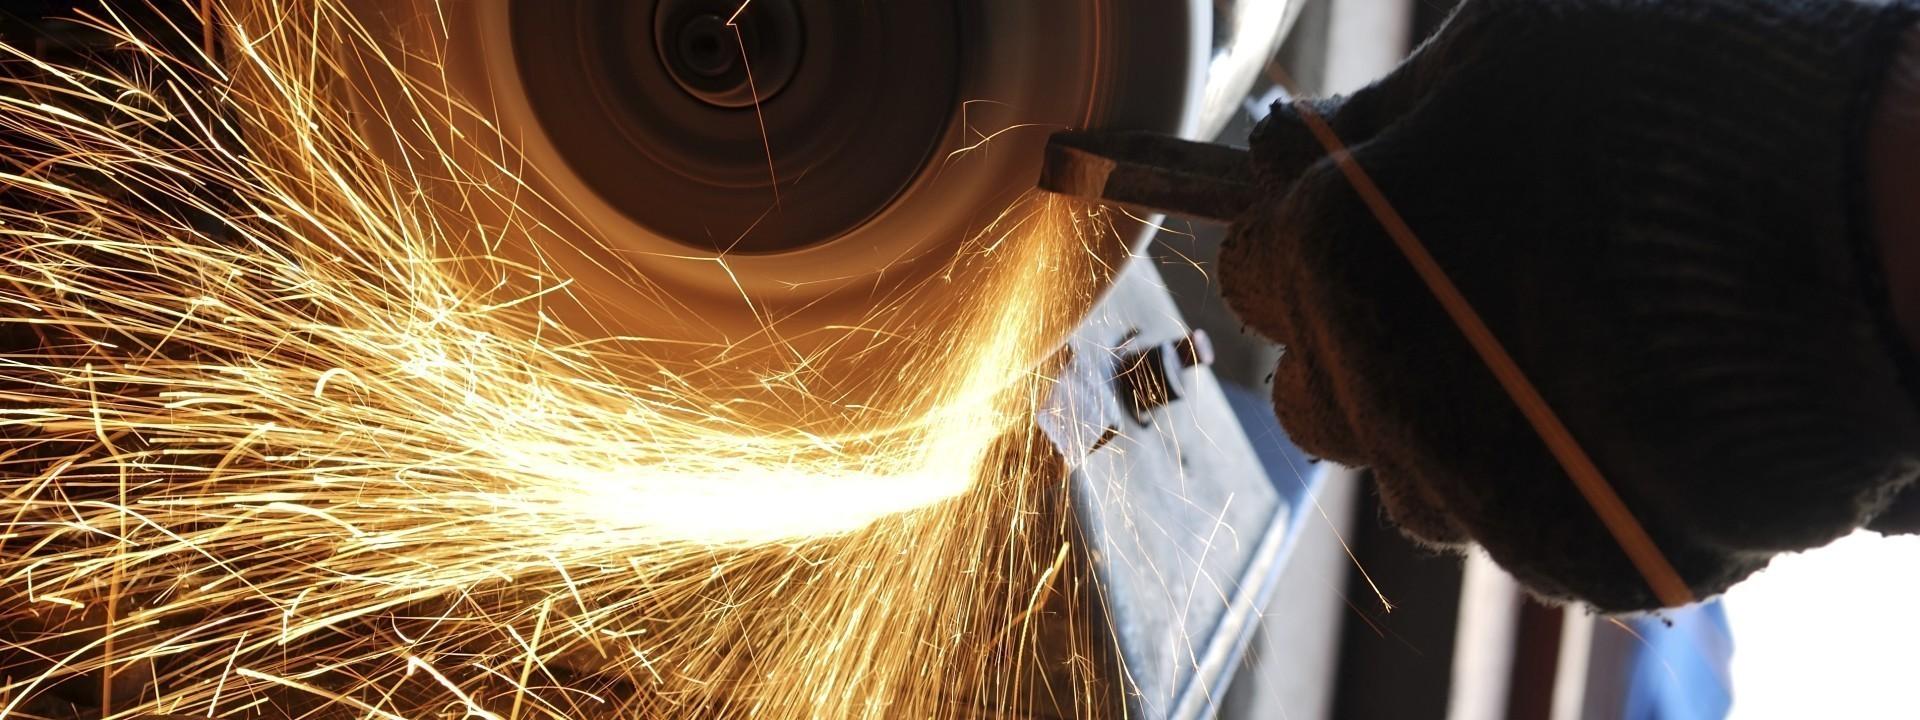 iStock 000010798723 Large 1 fpztkbzfhu - Механическая обработка металла